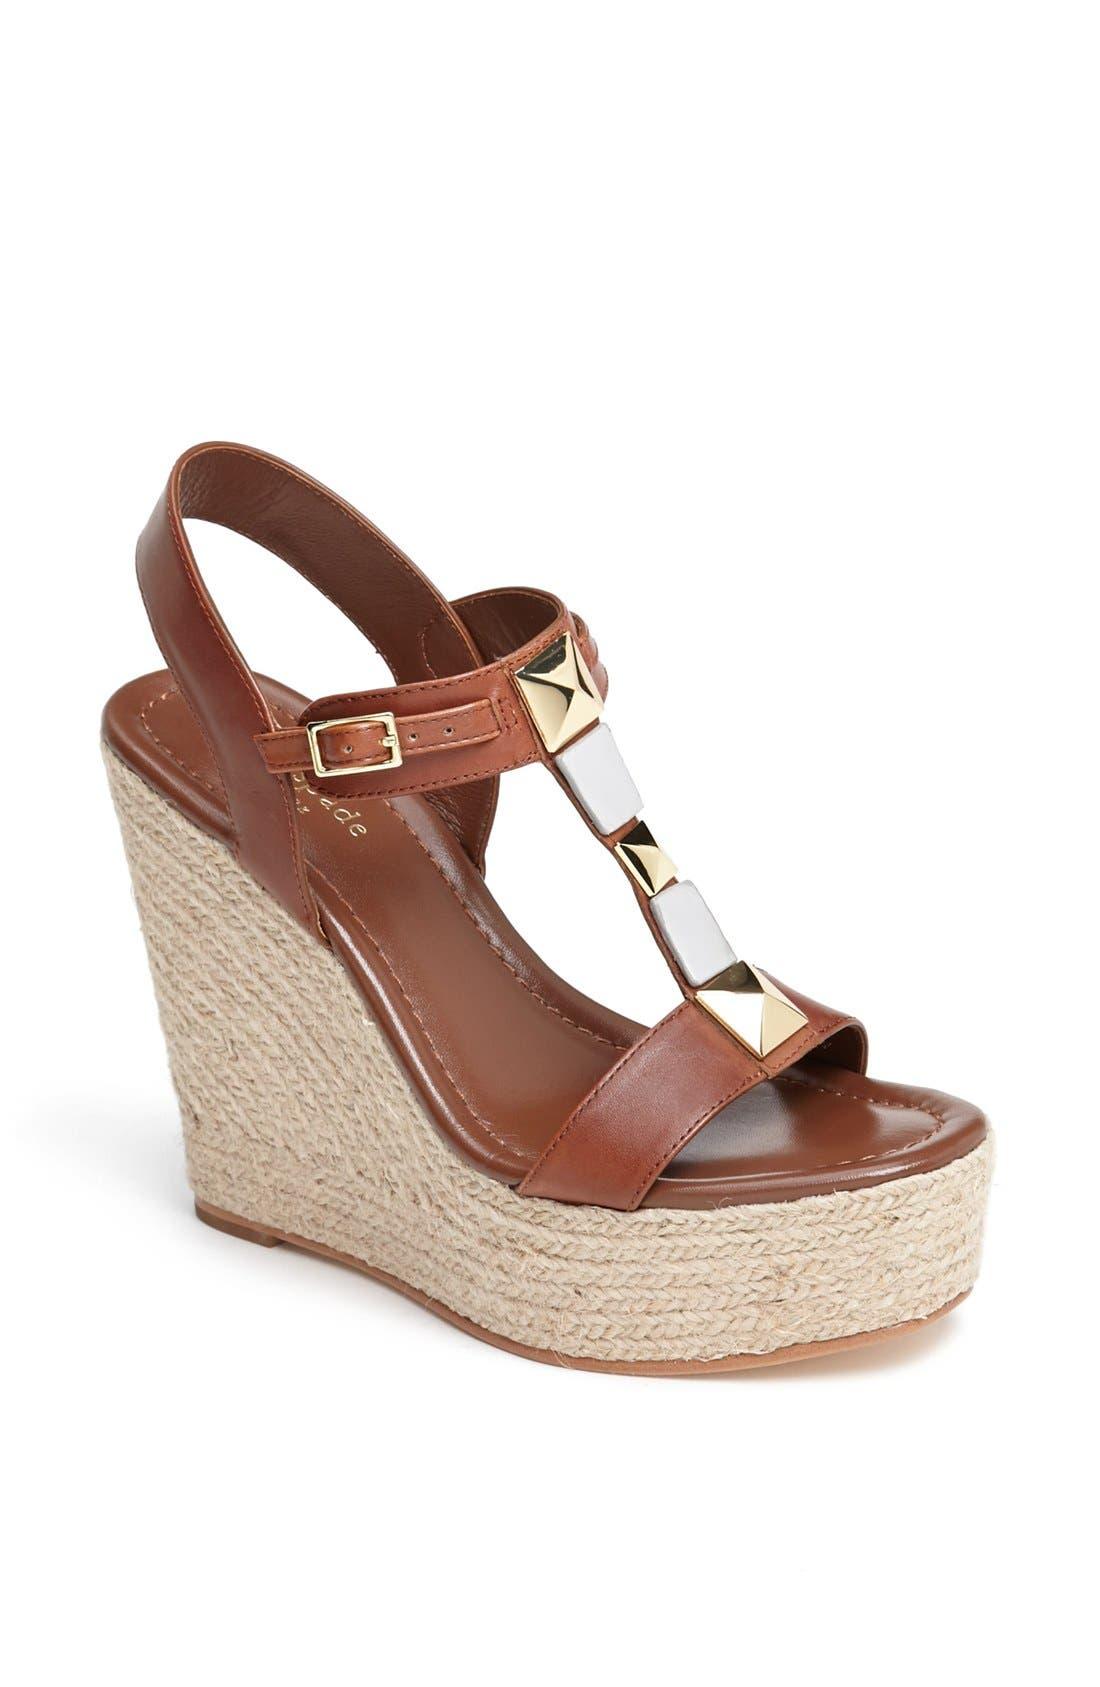 Main Image - kate spade new york 'luxe' platform espadrille sandal